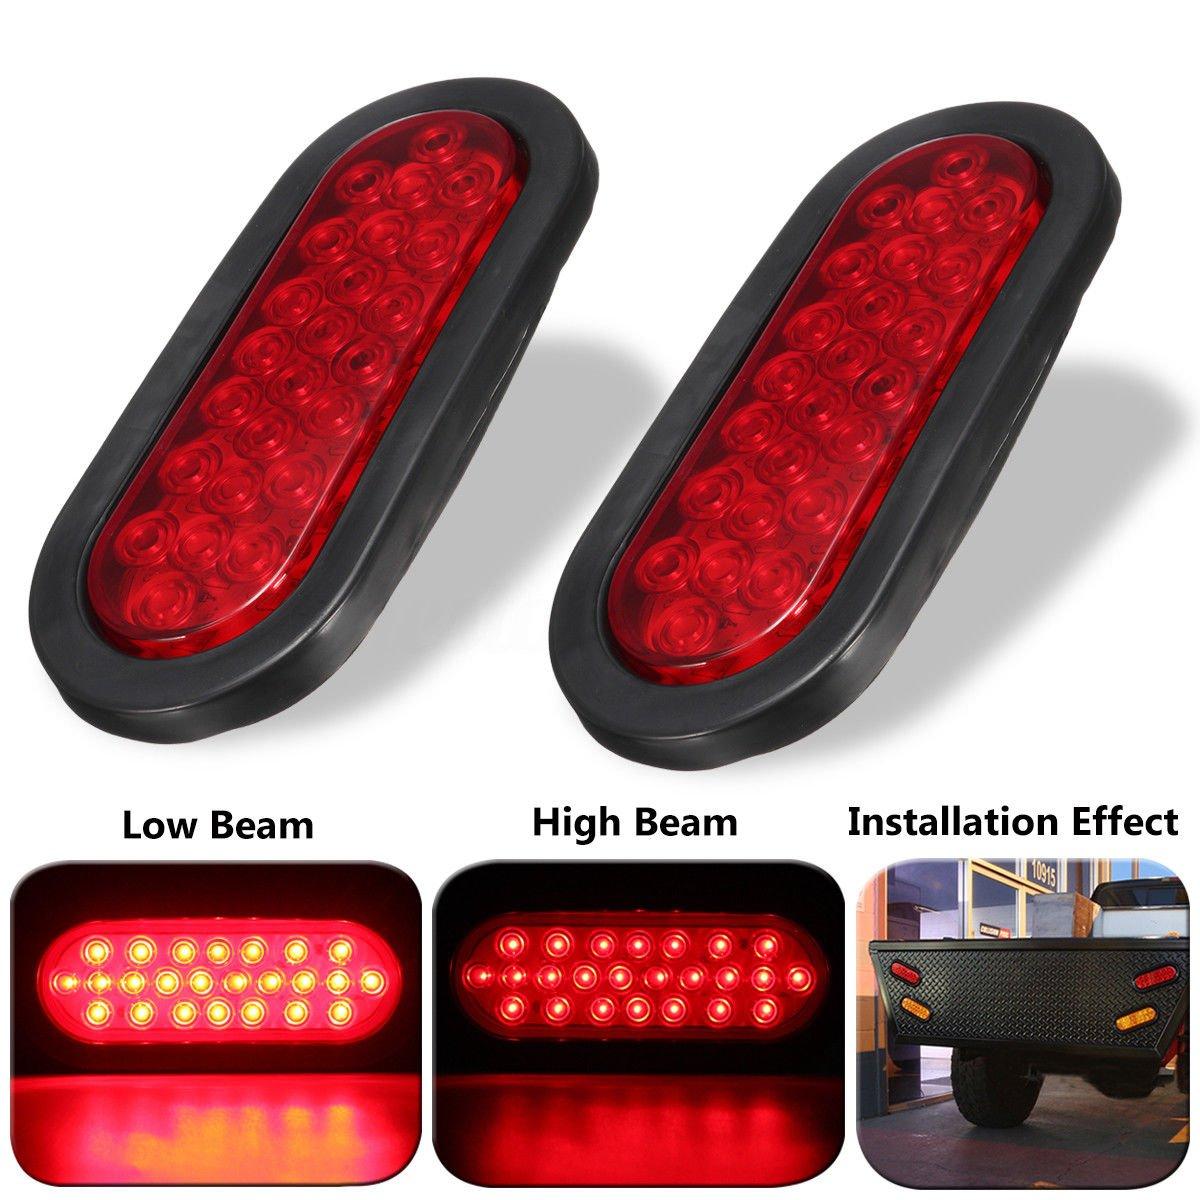 "Amazon.com: Wilk 2 Red Oval Sealed LED Surface Mount 6"" Oval Stop Turn Tail  Brake Light fit Trailer Truck Boat RV UTV: Automotive"